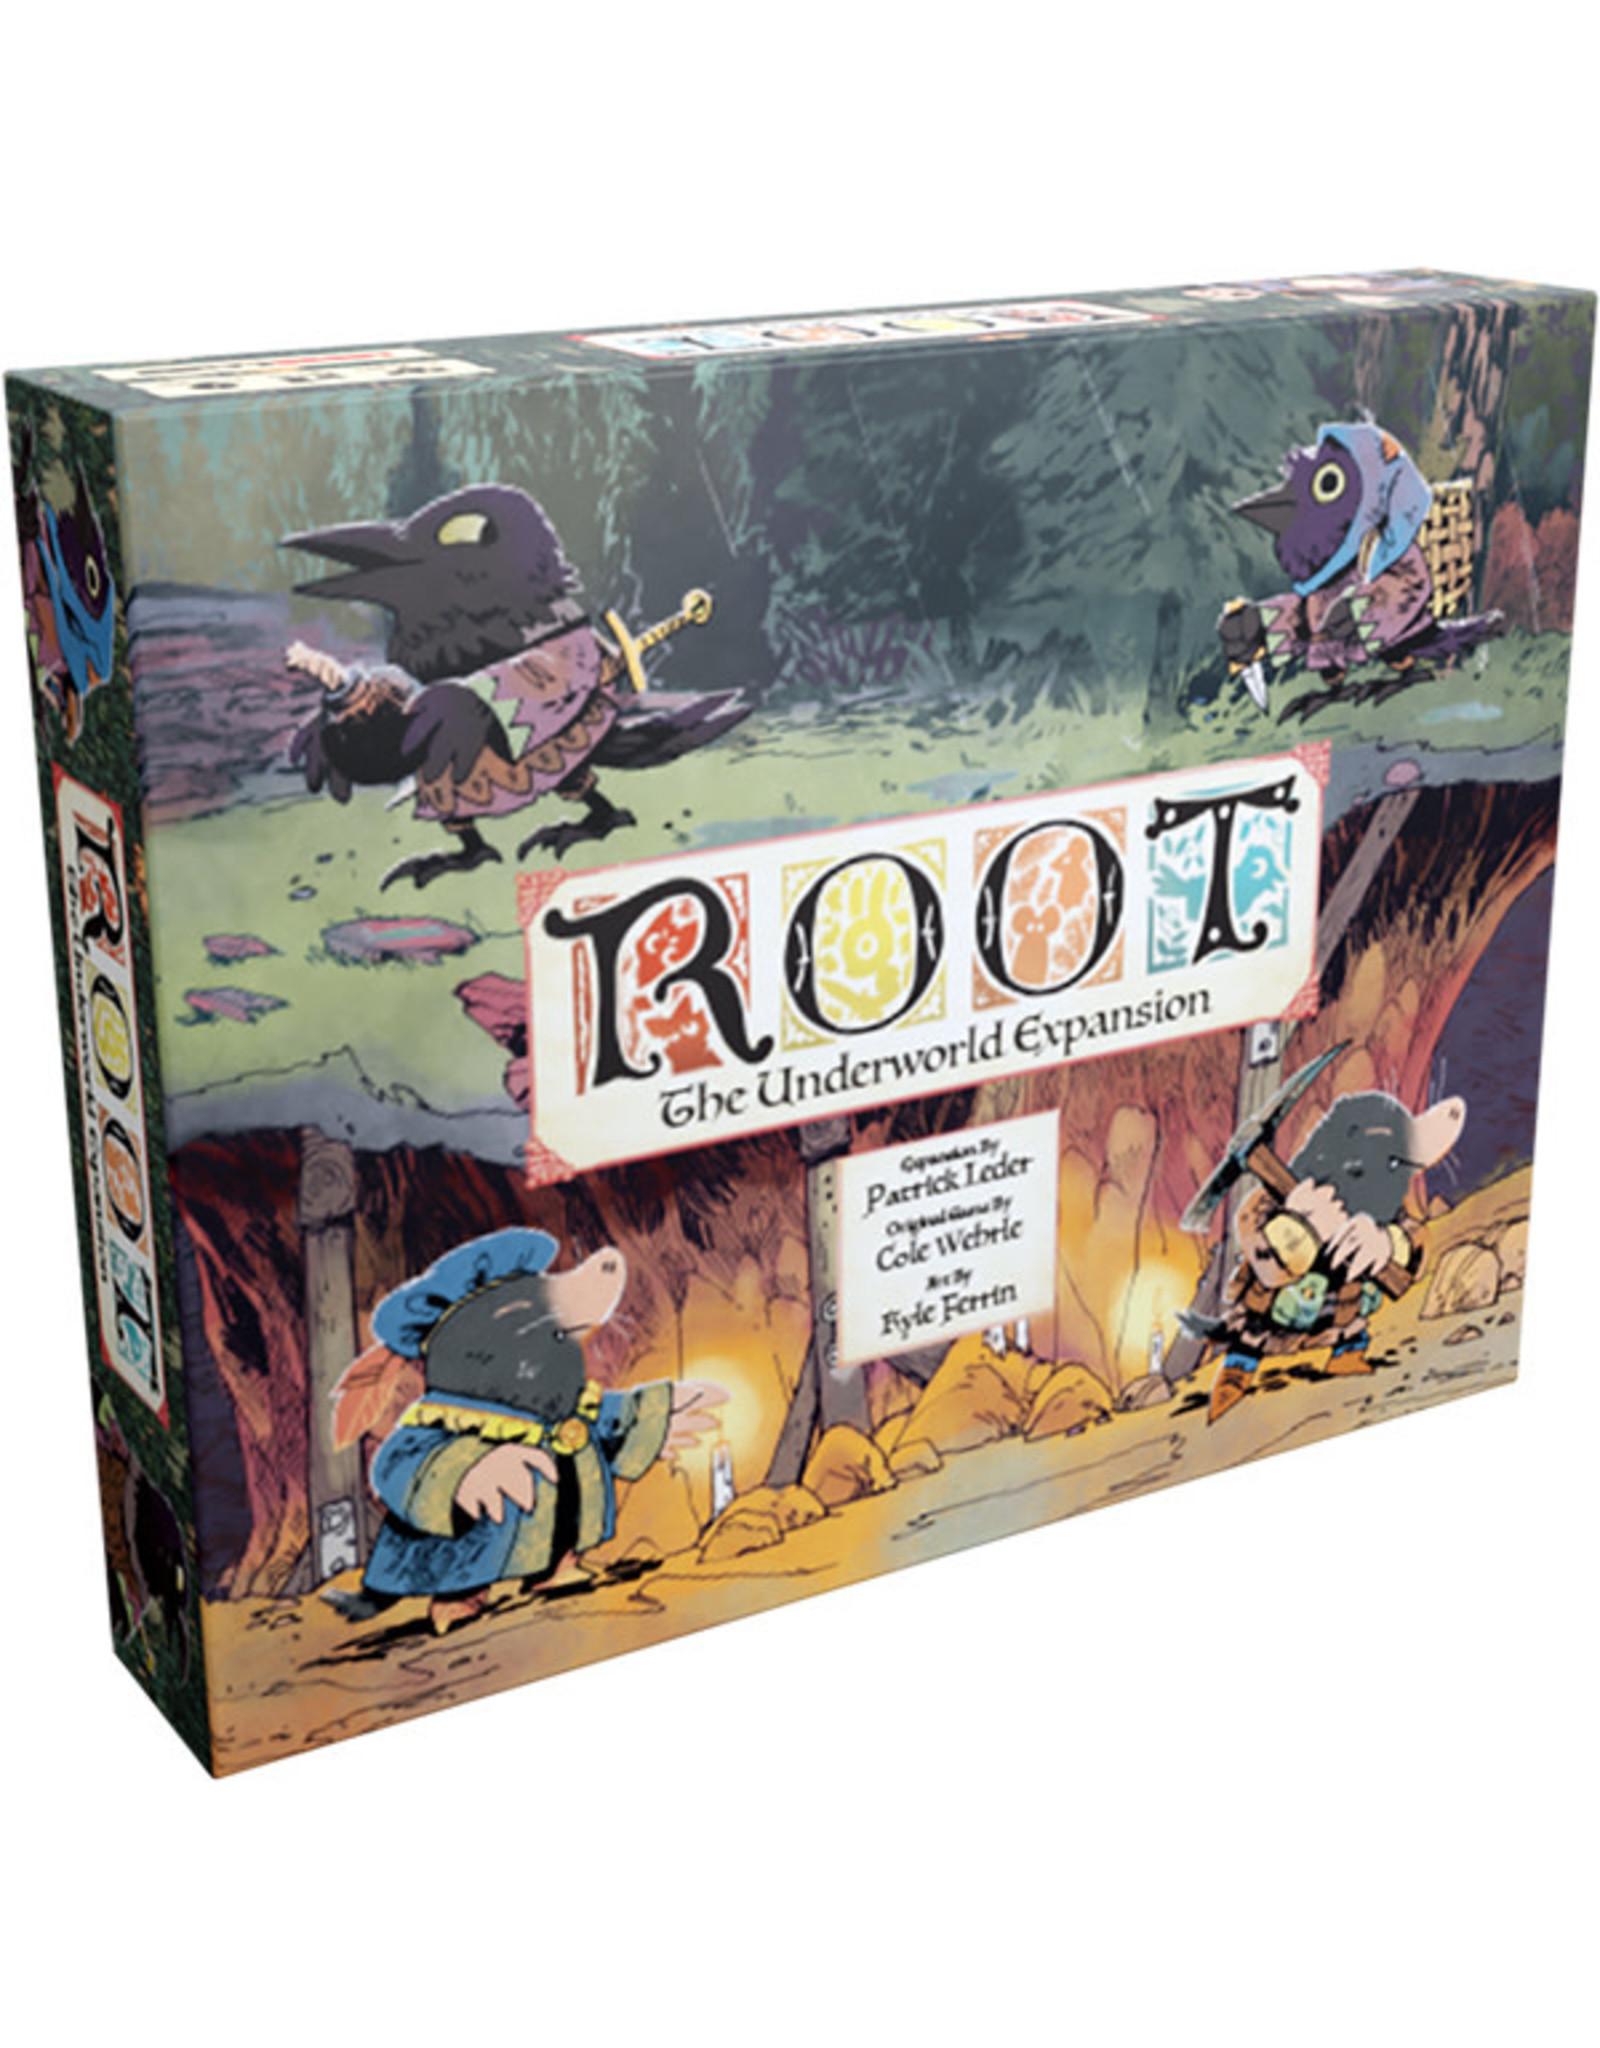 Leder Games Root Underworld Retail Edition (Expansion)